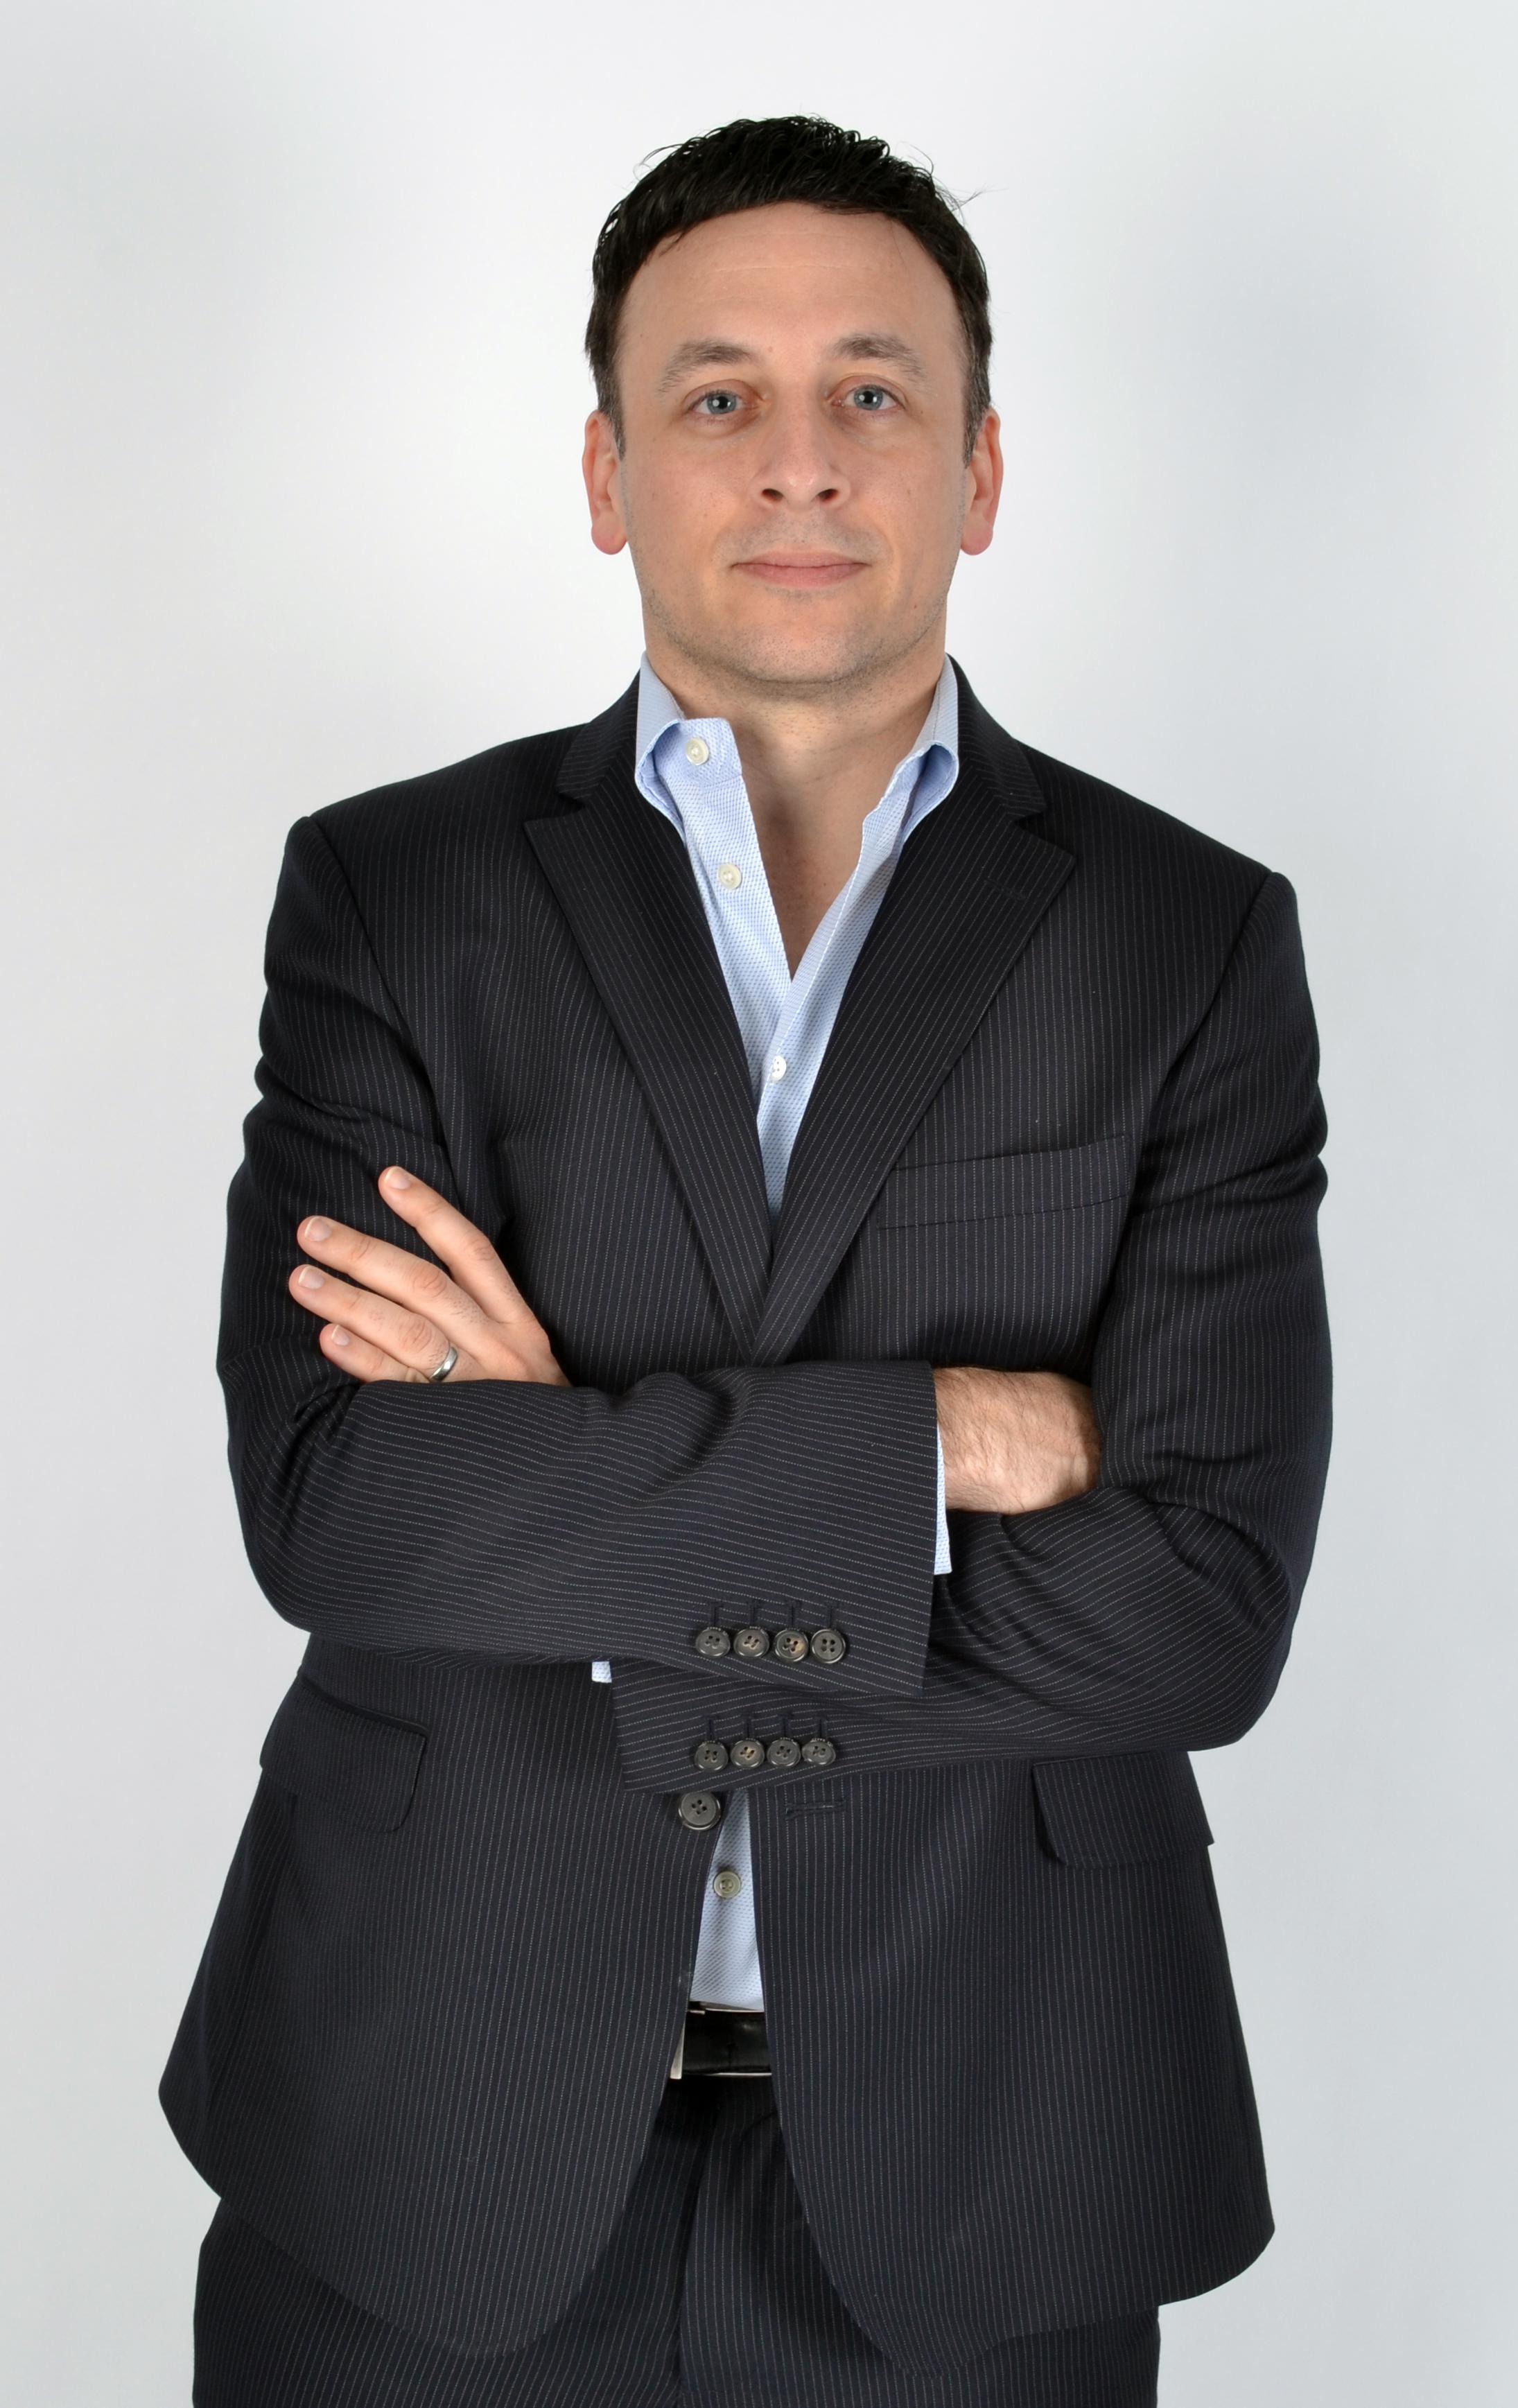 Michael Chasen